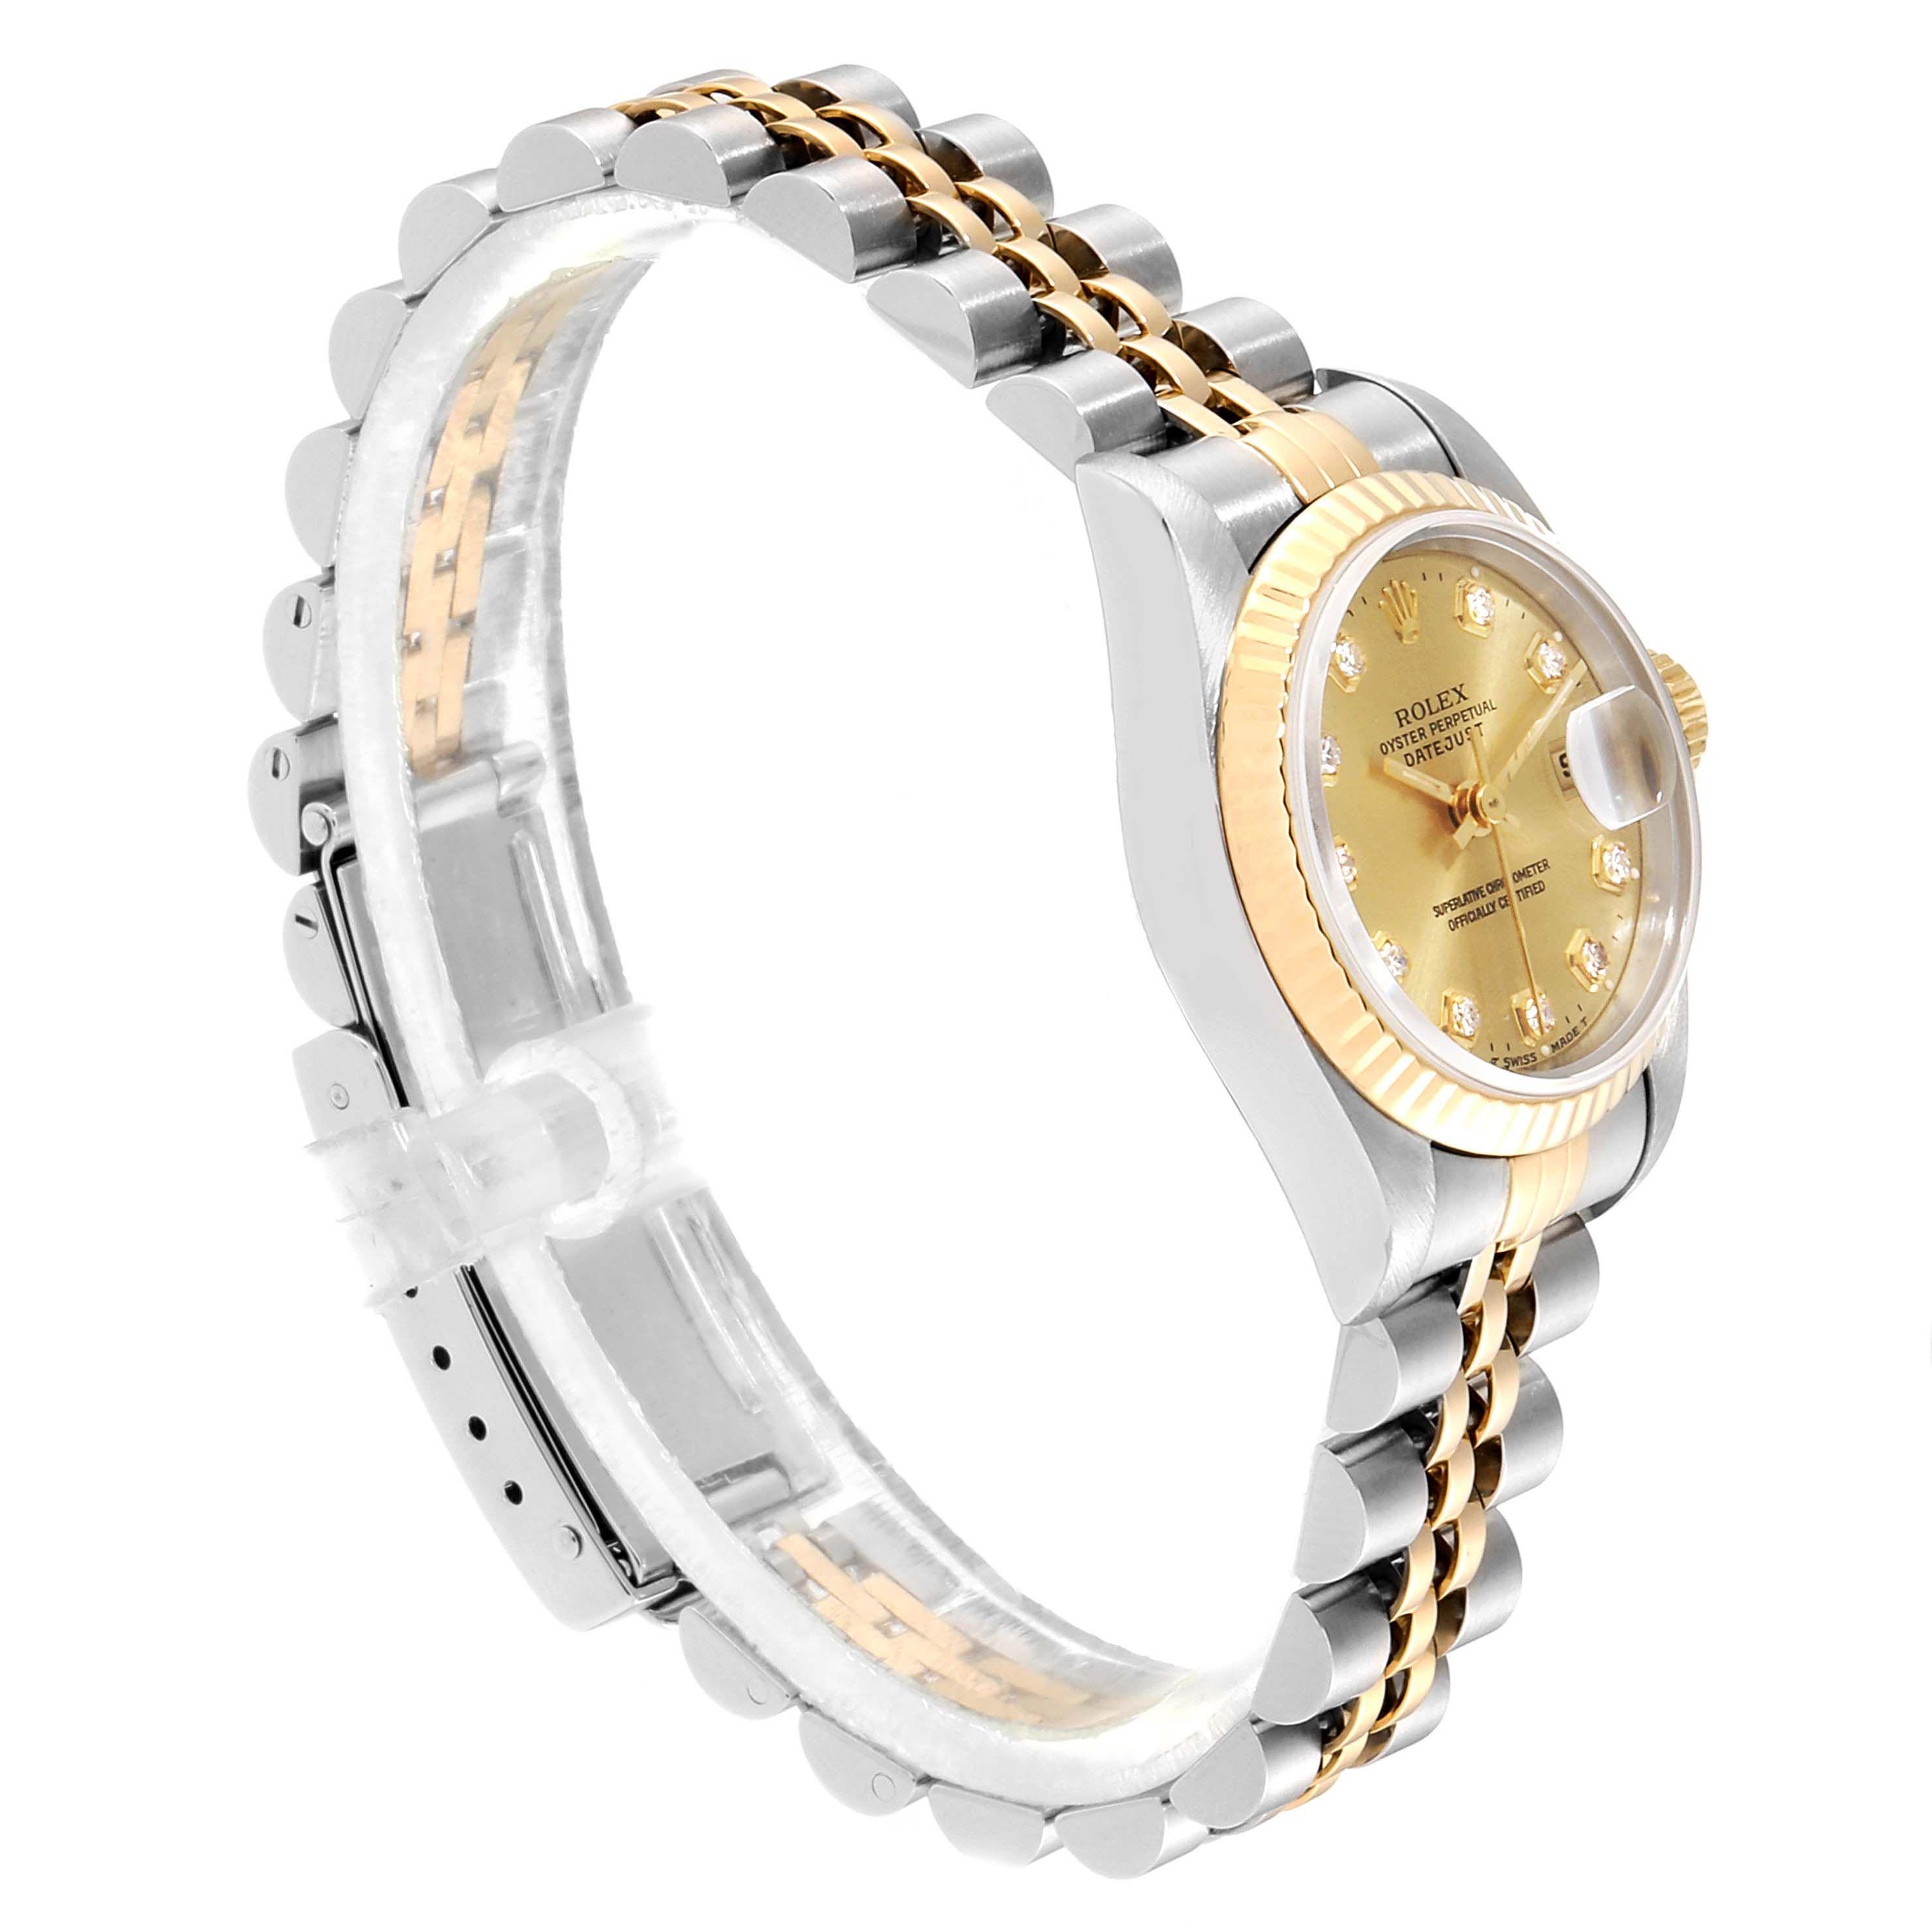 Rolex Datejust Steel Yellow Gold Diamond Dial La S Watch